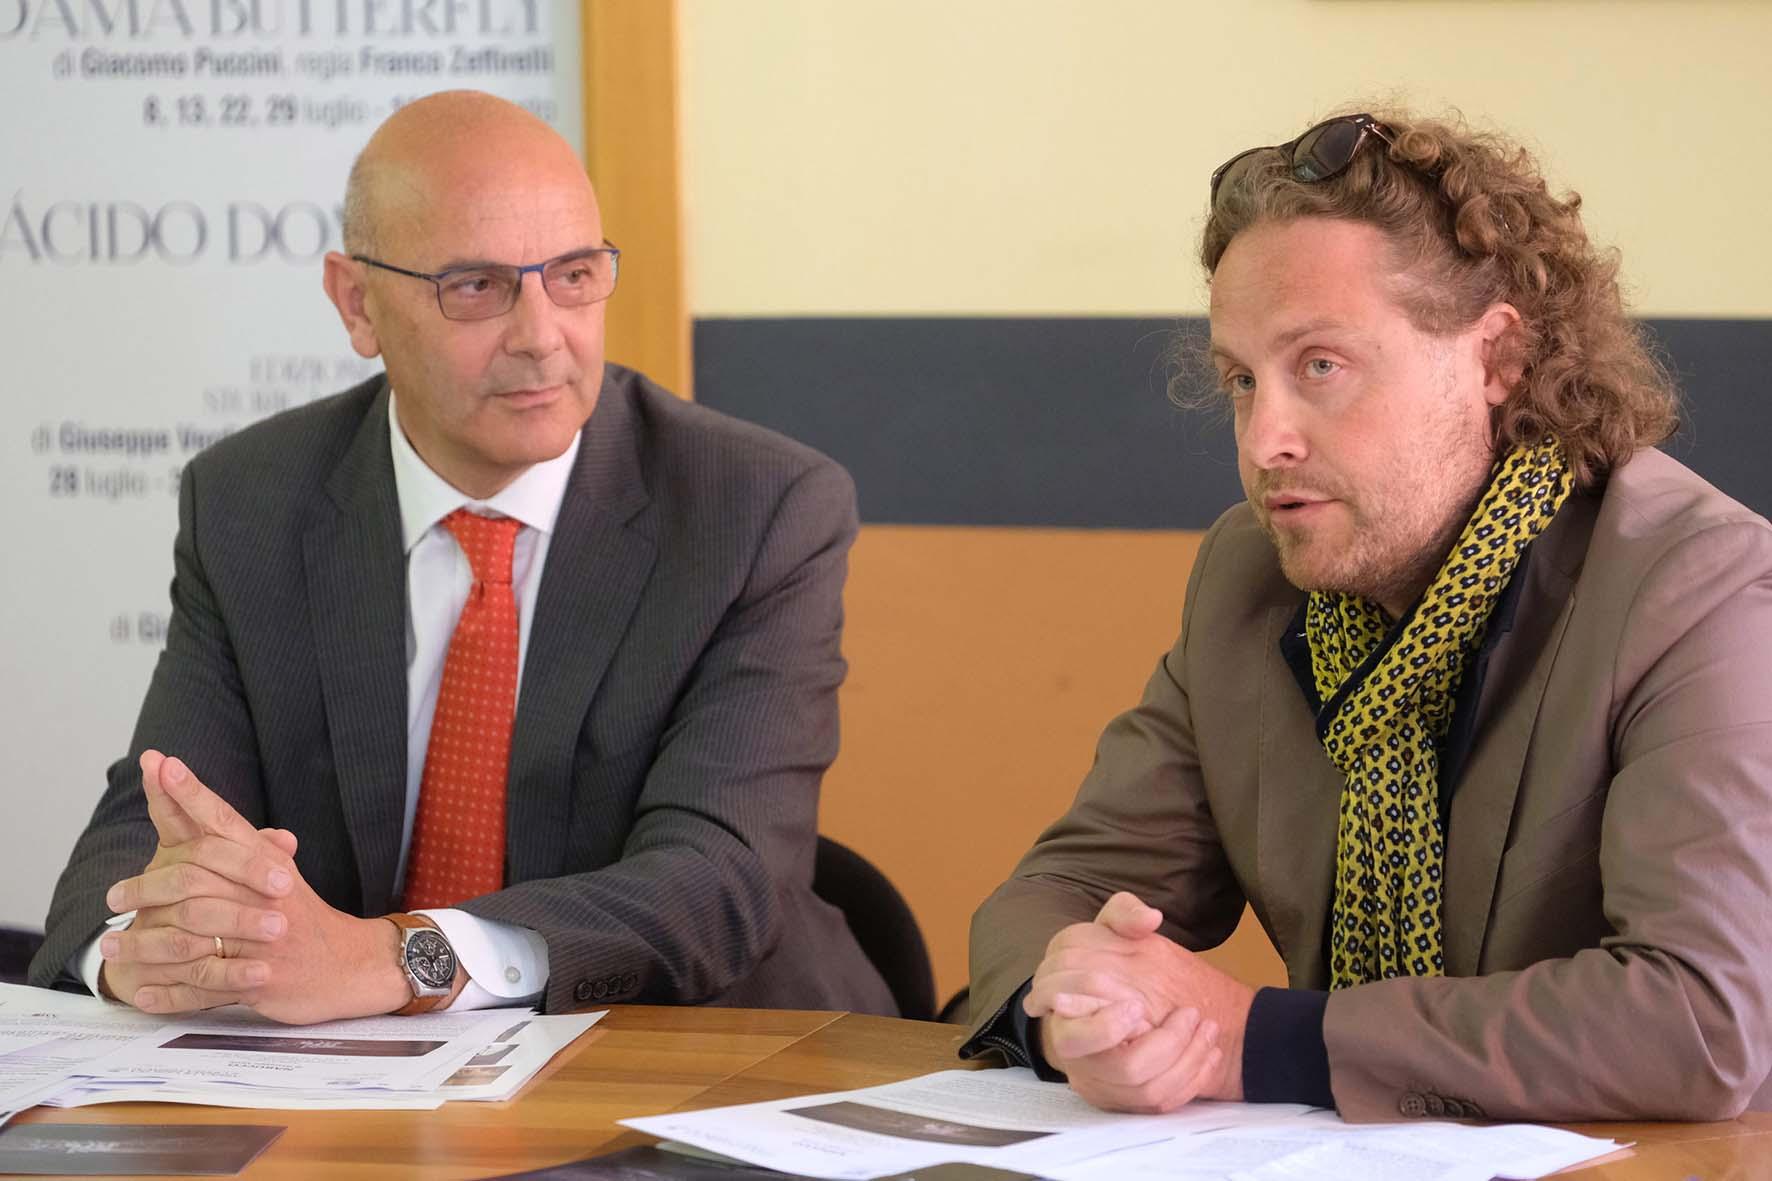 Arena verona 2017 Conferenza stampa Nabucco Polo Bernard FotoEnnevi 7638